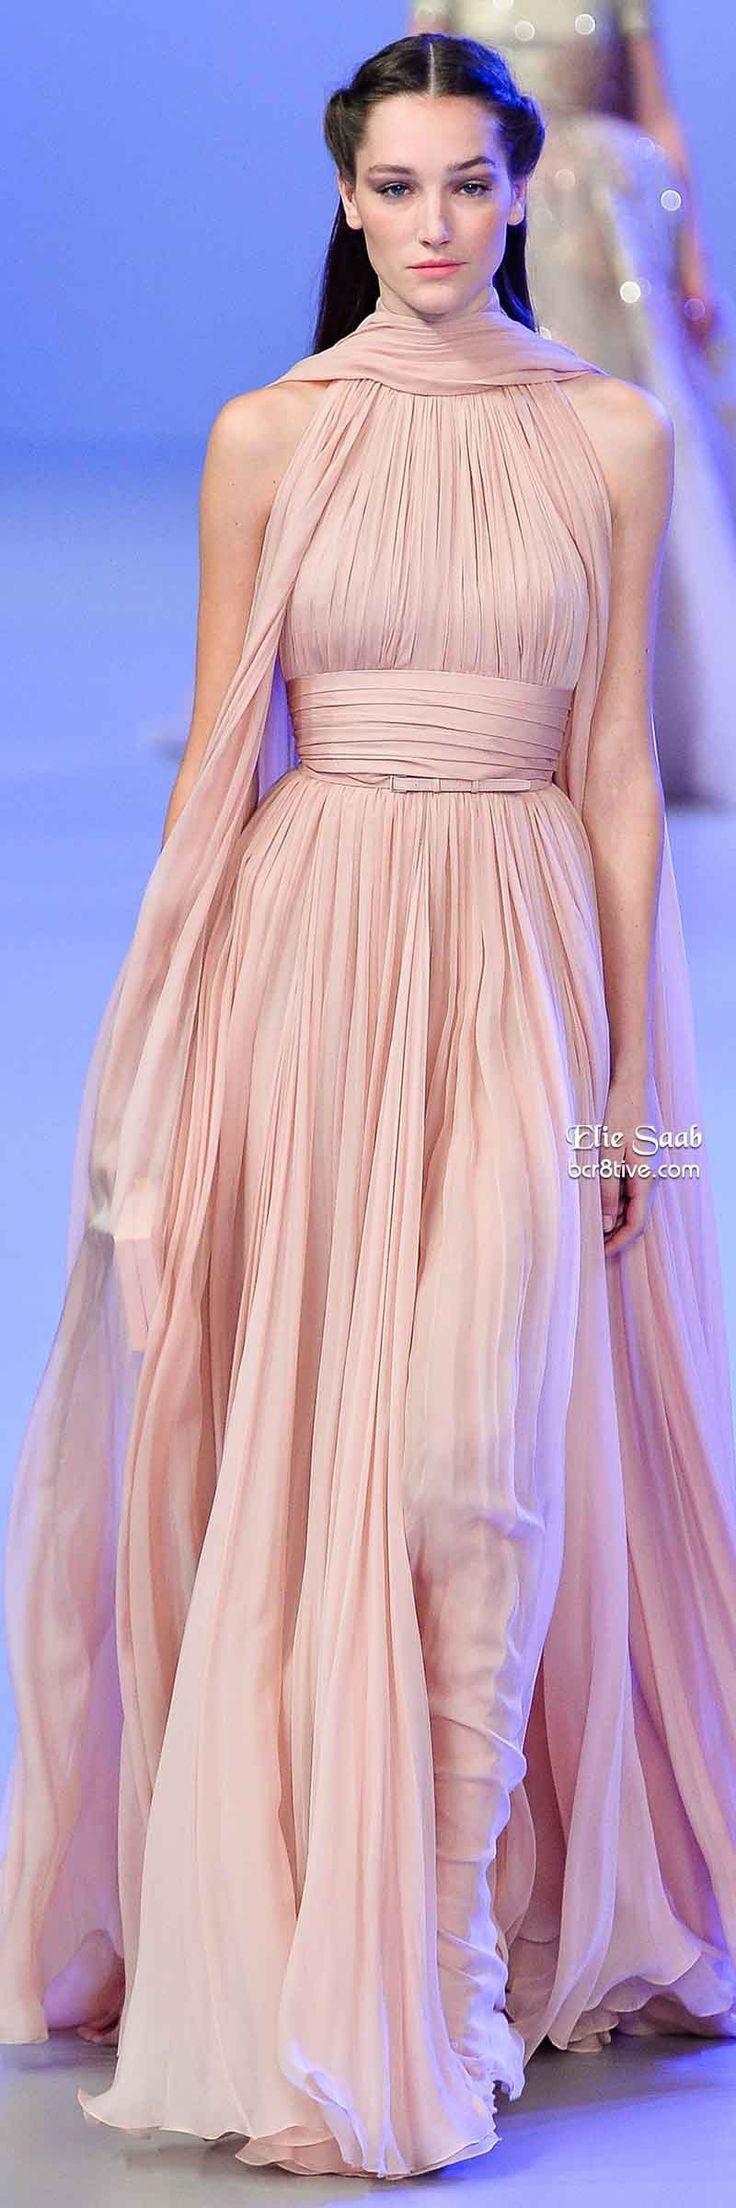 984 best Vestidos de Festa images on Pinterest | Evening gowns ...